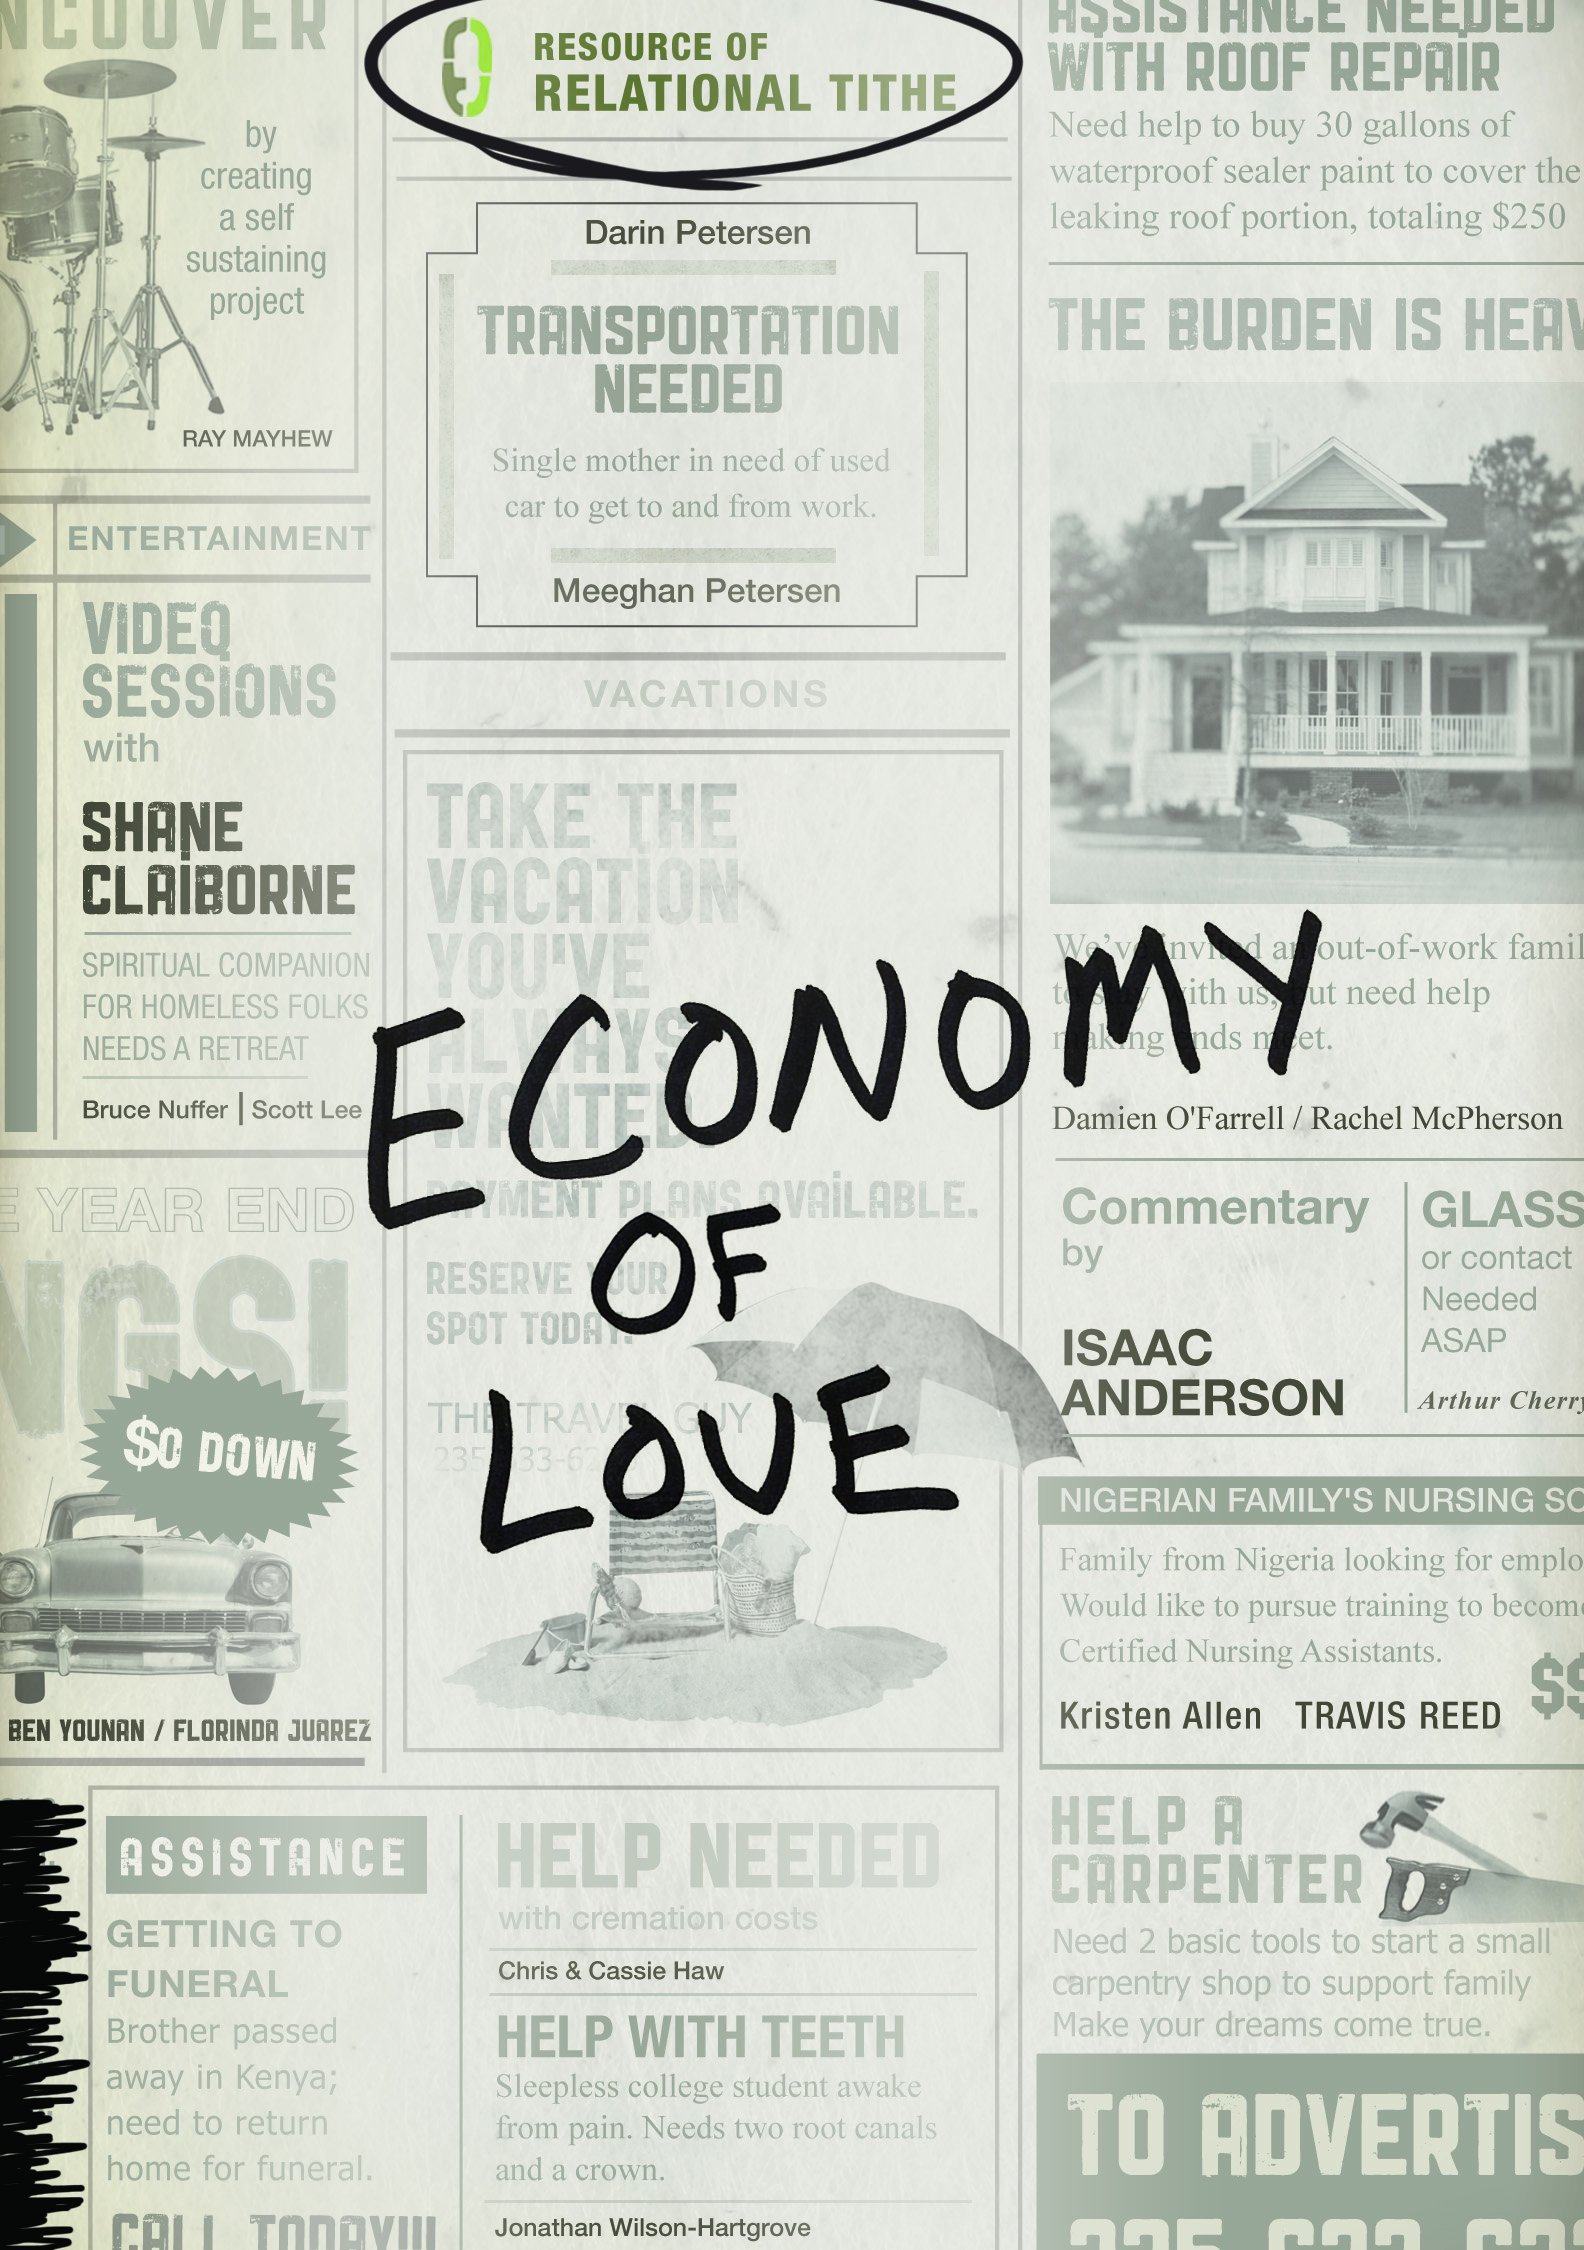 Economy of Love: Creating a Community of Enough ePub fb2 ebook